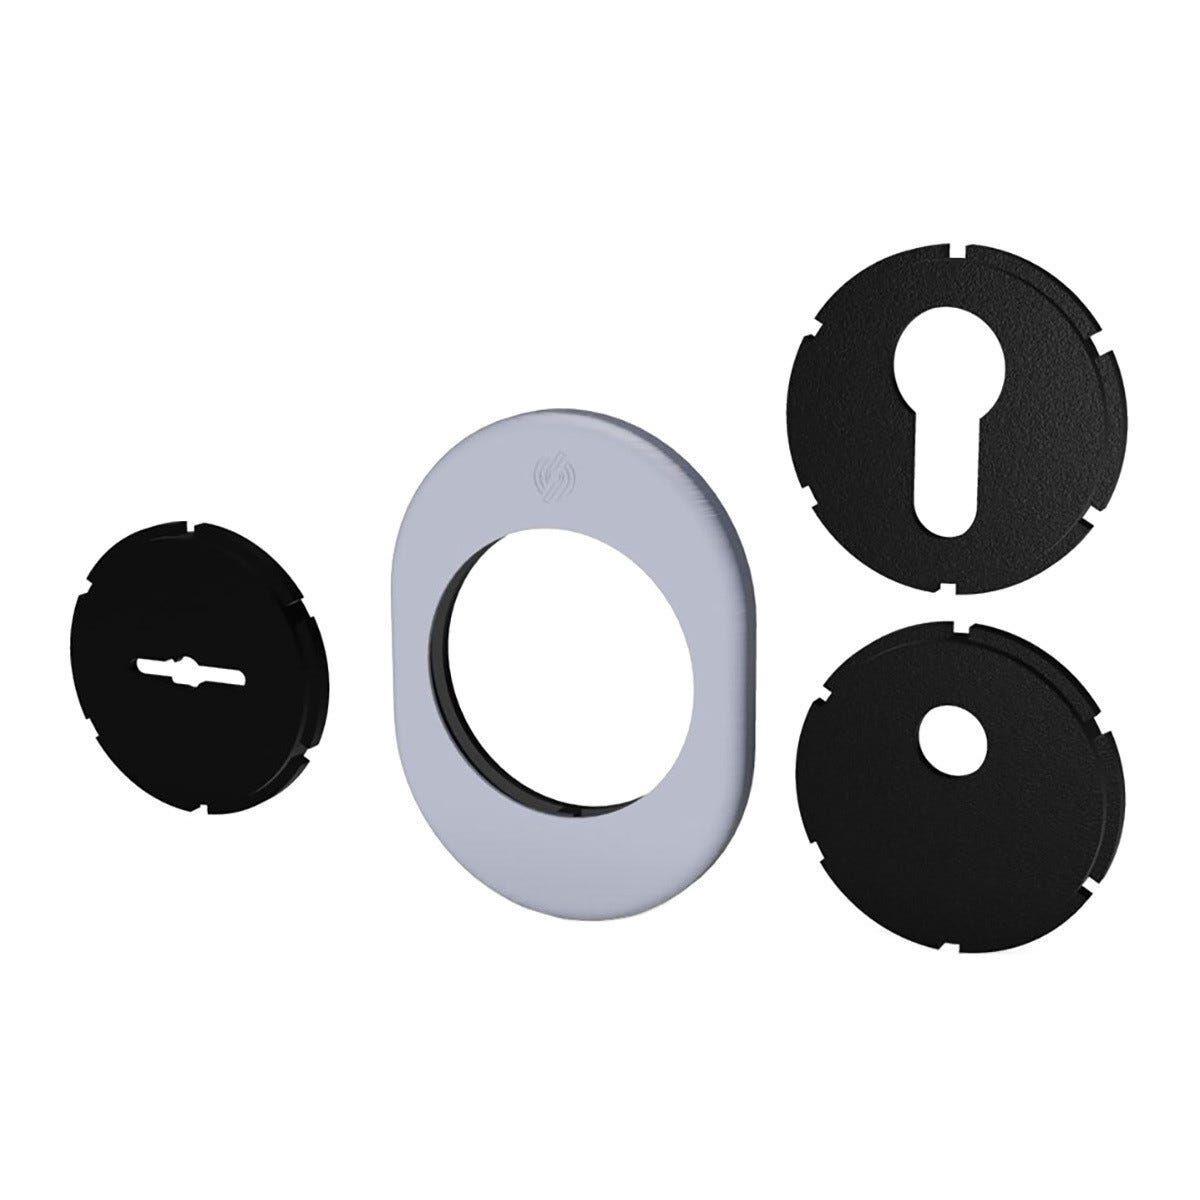 SECUREMME Kit Mostrina Universale Cromo Satinato 82x62mm Per Porte Blindate